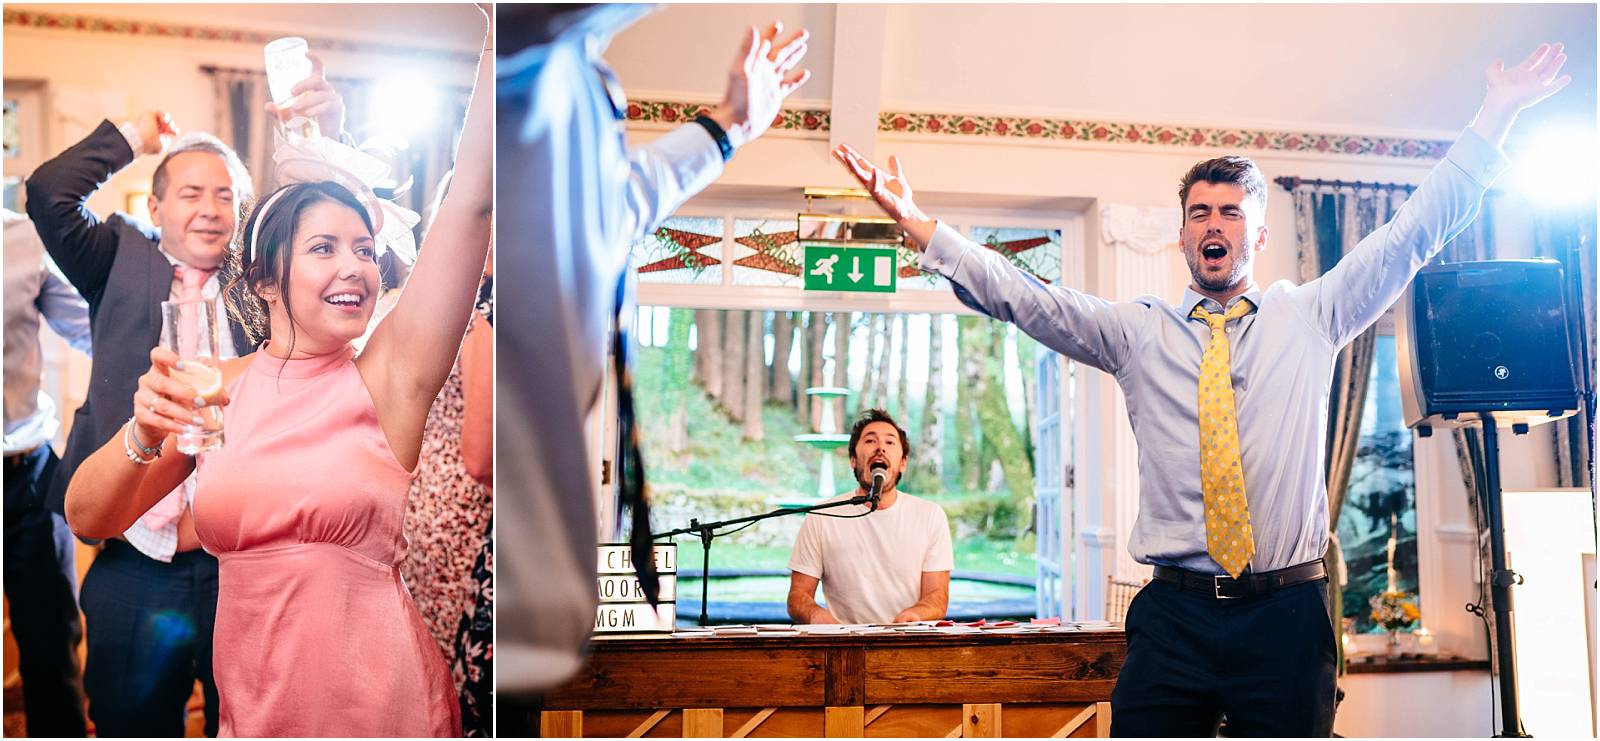 michael g moore total wedding legend